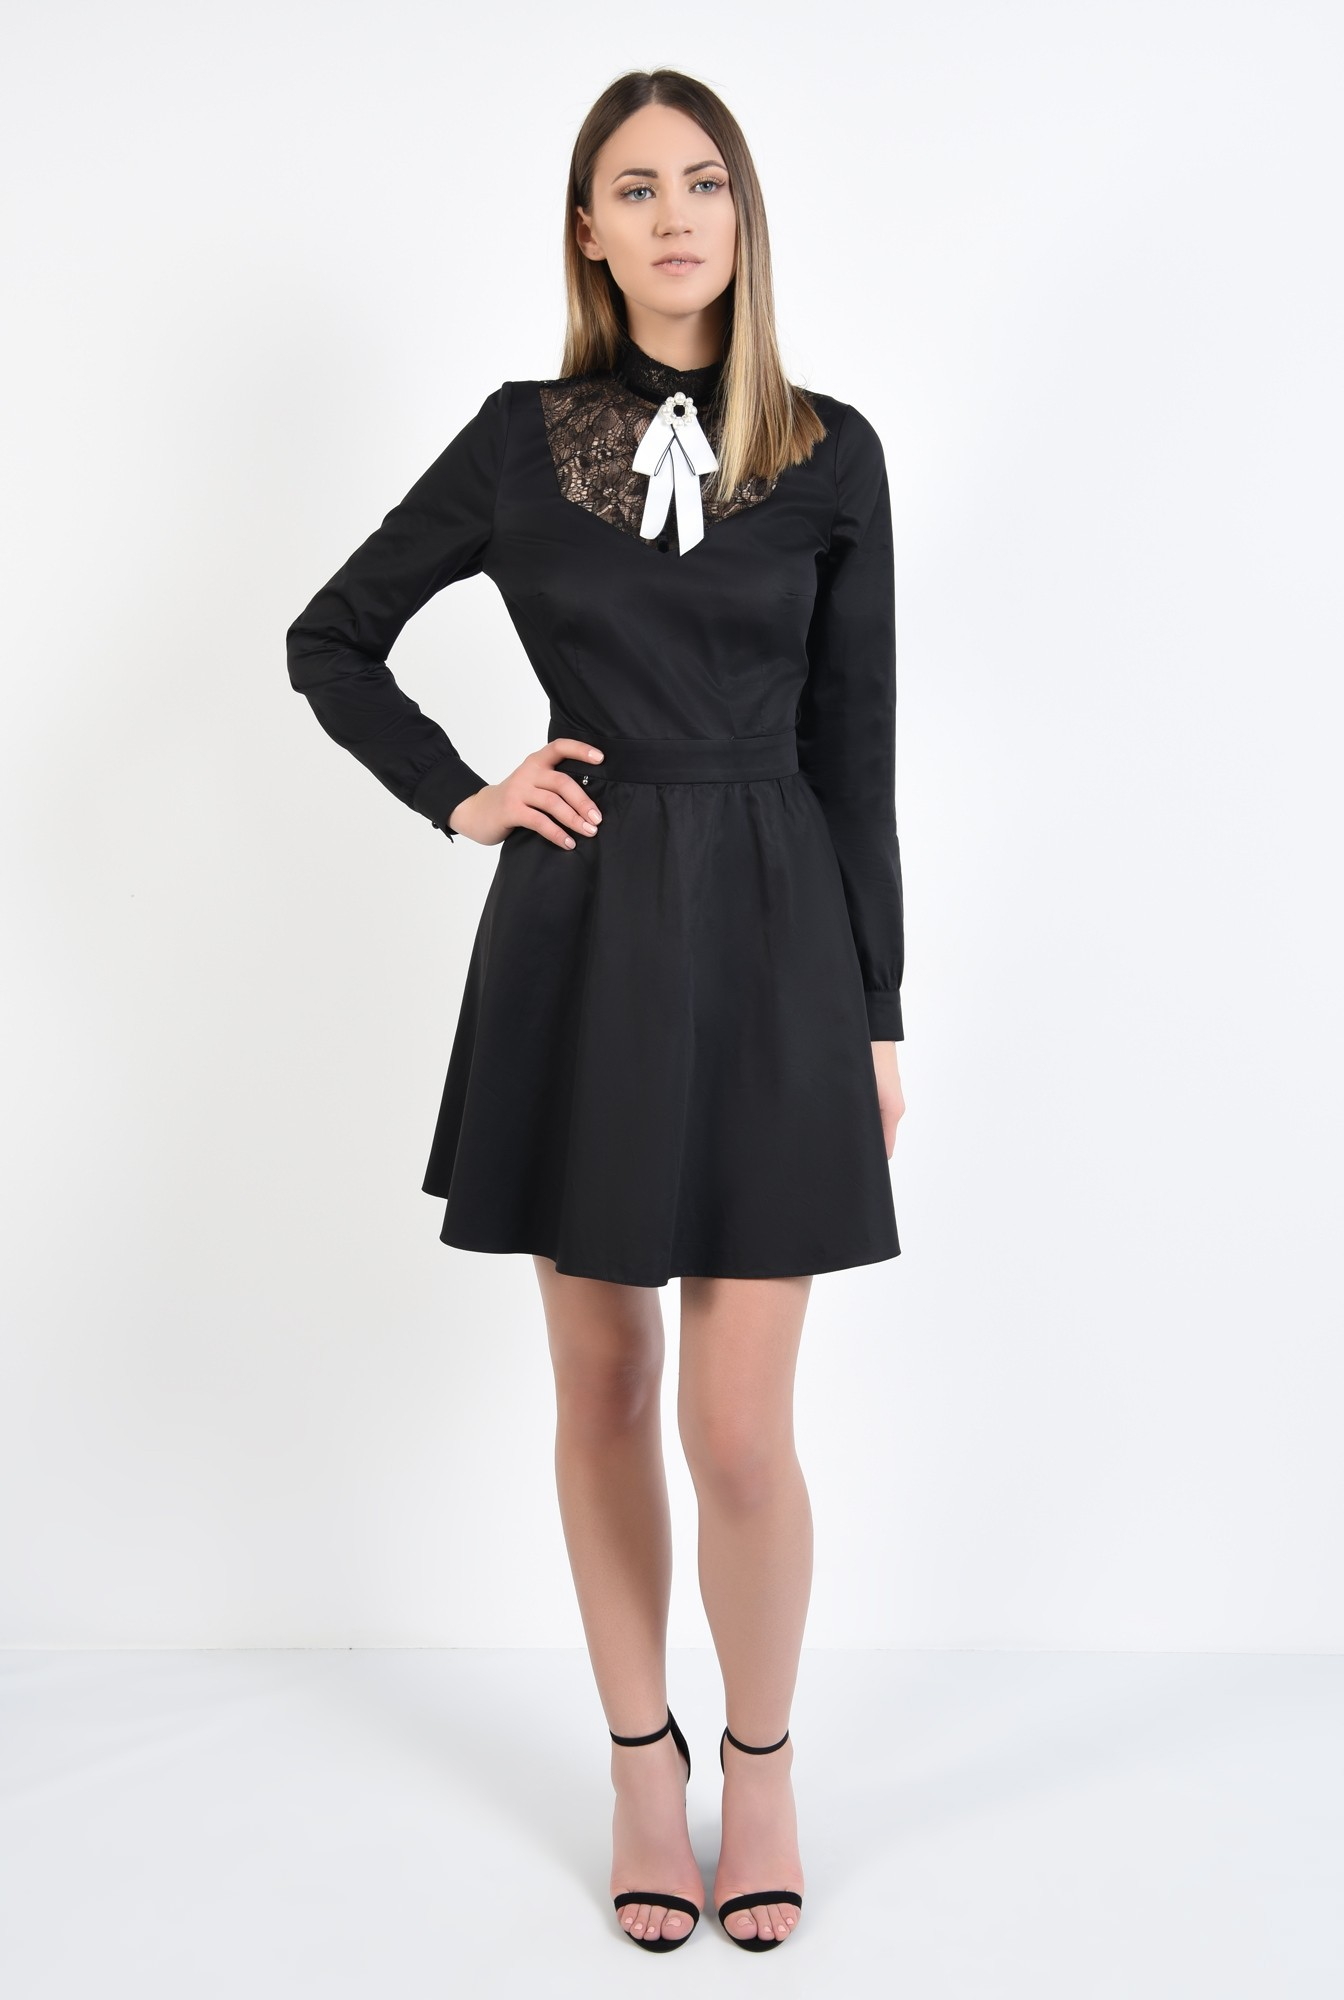 3 - rochie neagra, cu platca din dantela, cu brosa, croi evazat